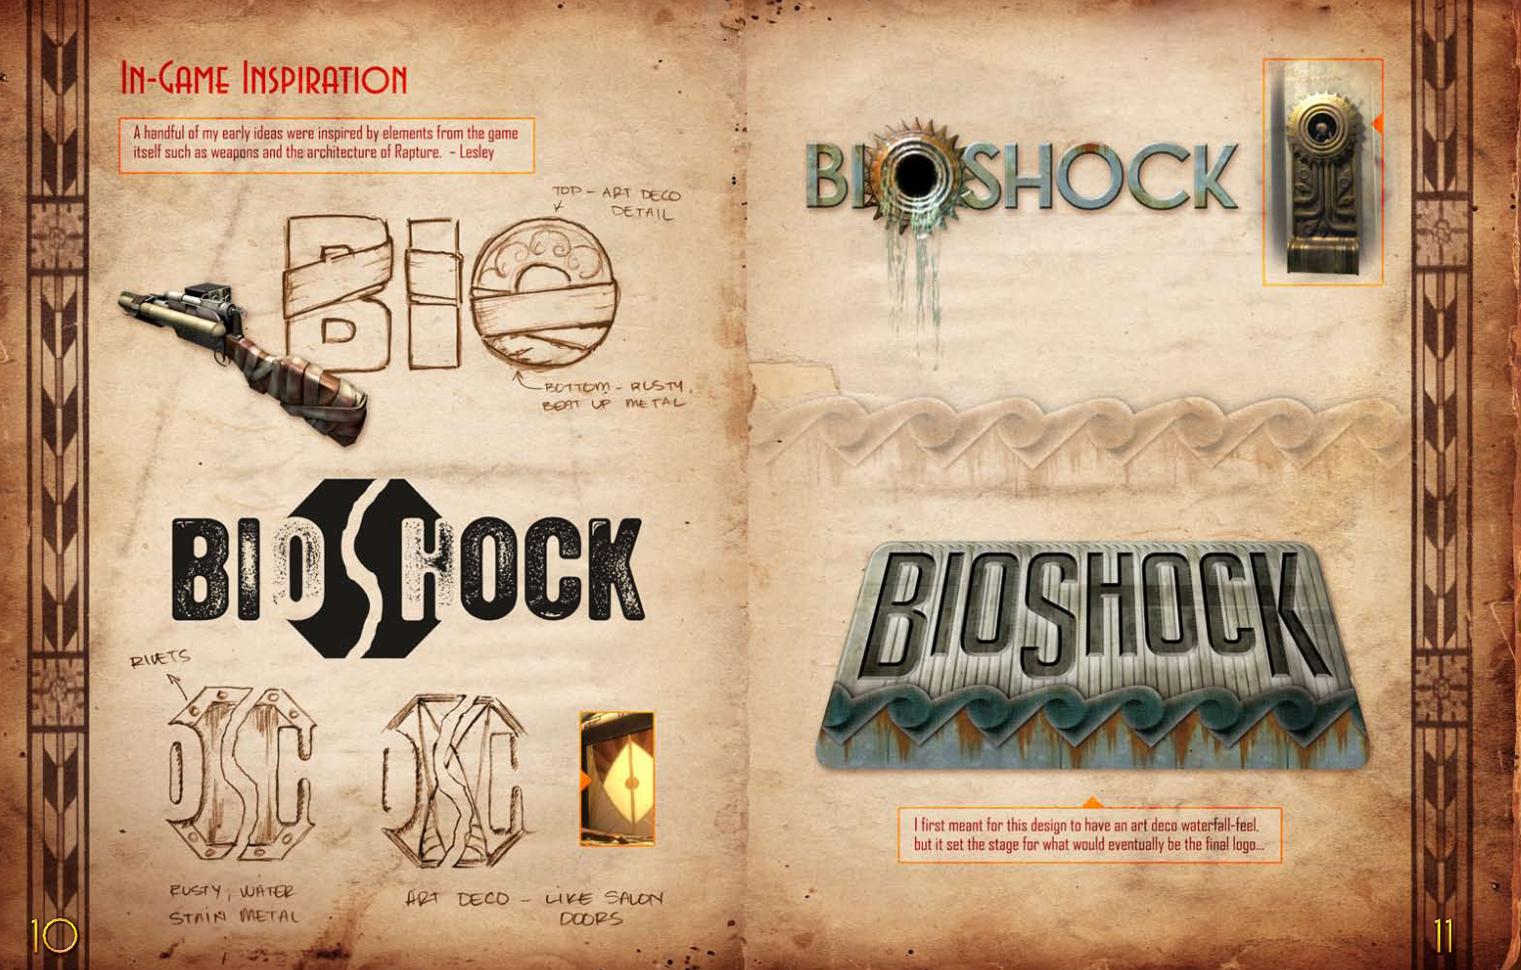 Developer S Edition Bioshock Artbook Coming Soon Gematsu